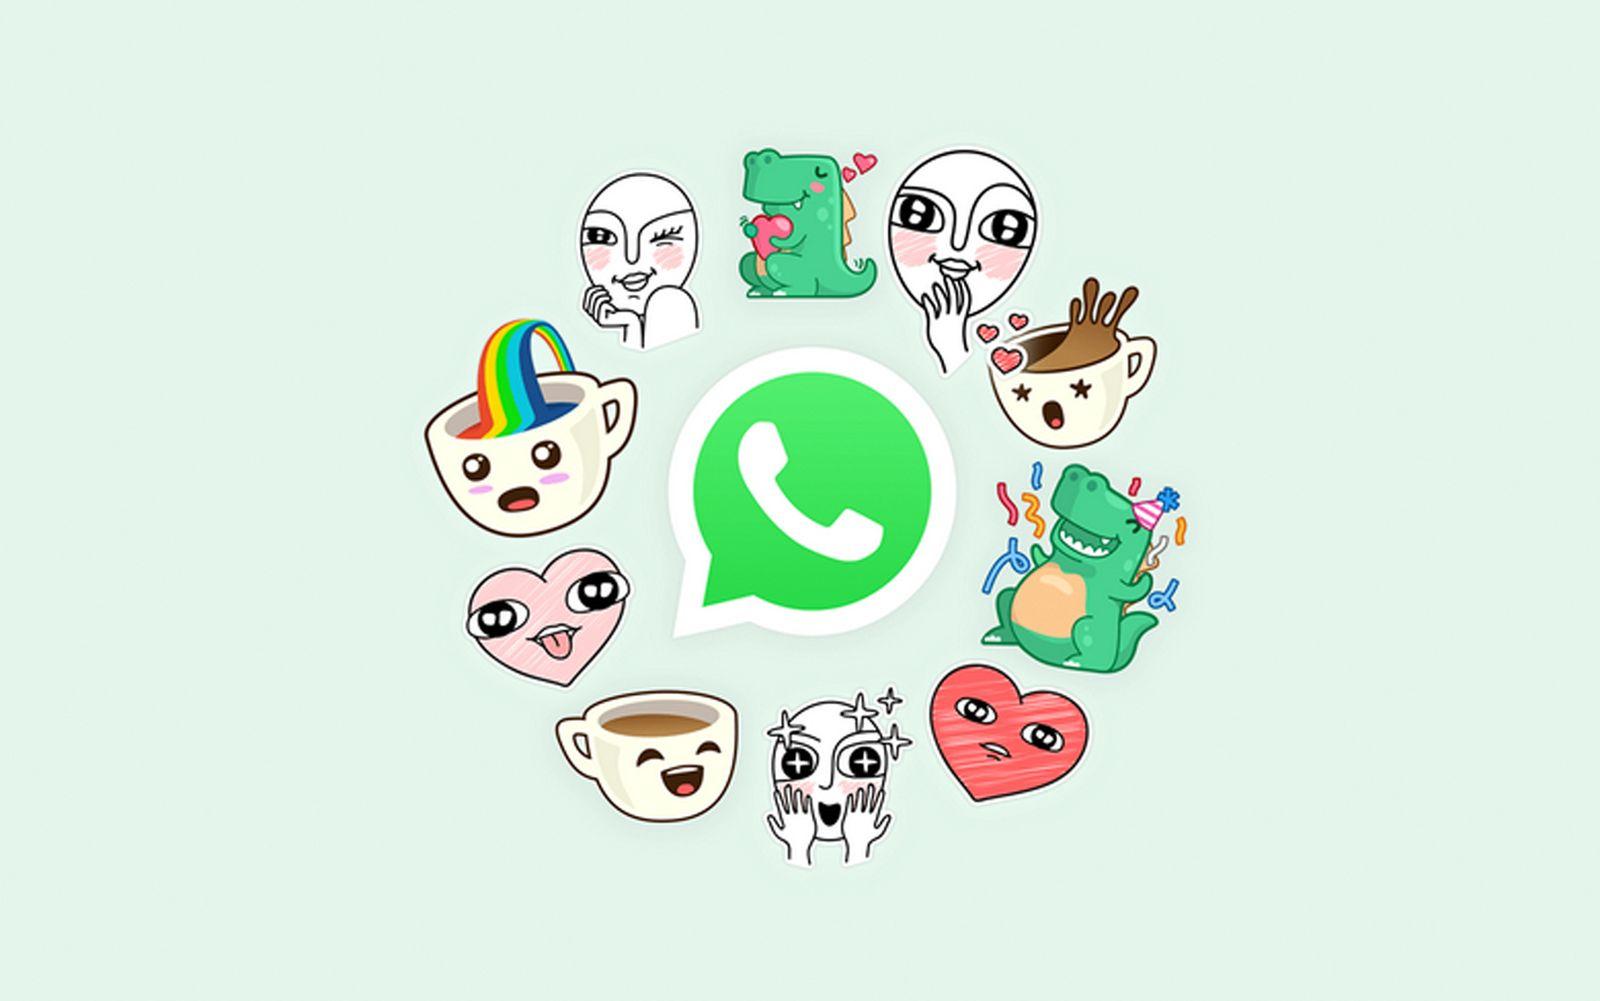 EINMALIGE VERWENDUNG Screenshot WhatsApp / Sticker